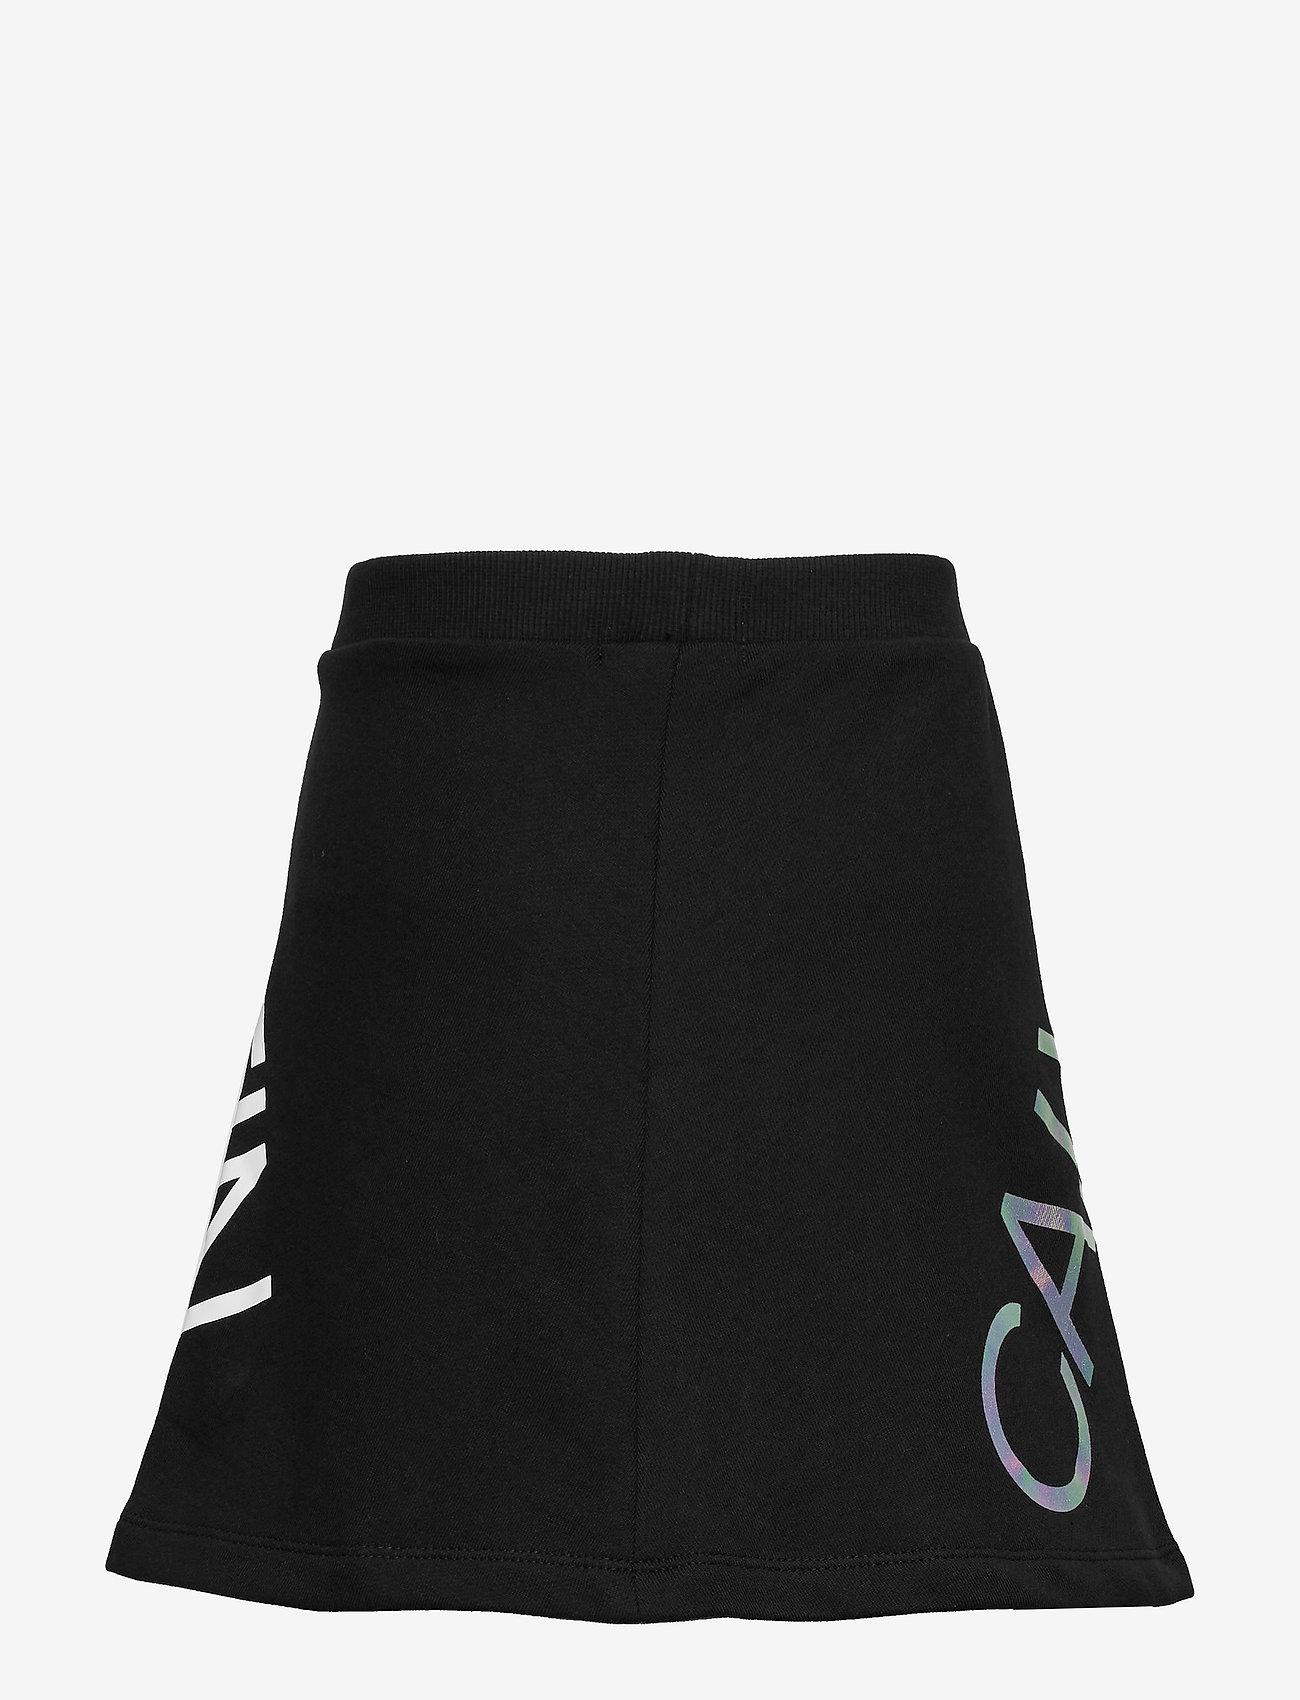 Calvin Klein - HERO LOGO SKIRT - spódnice - ck black - 1